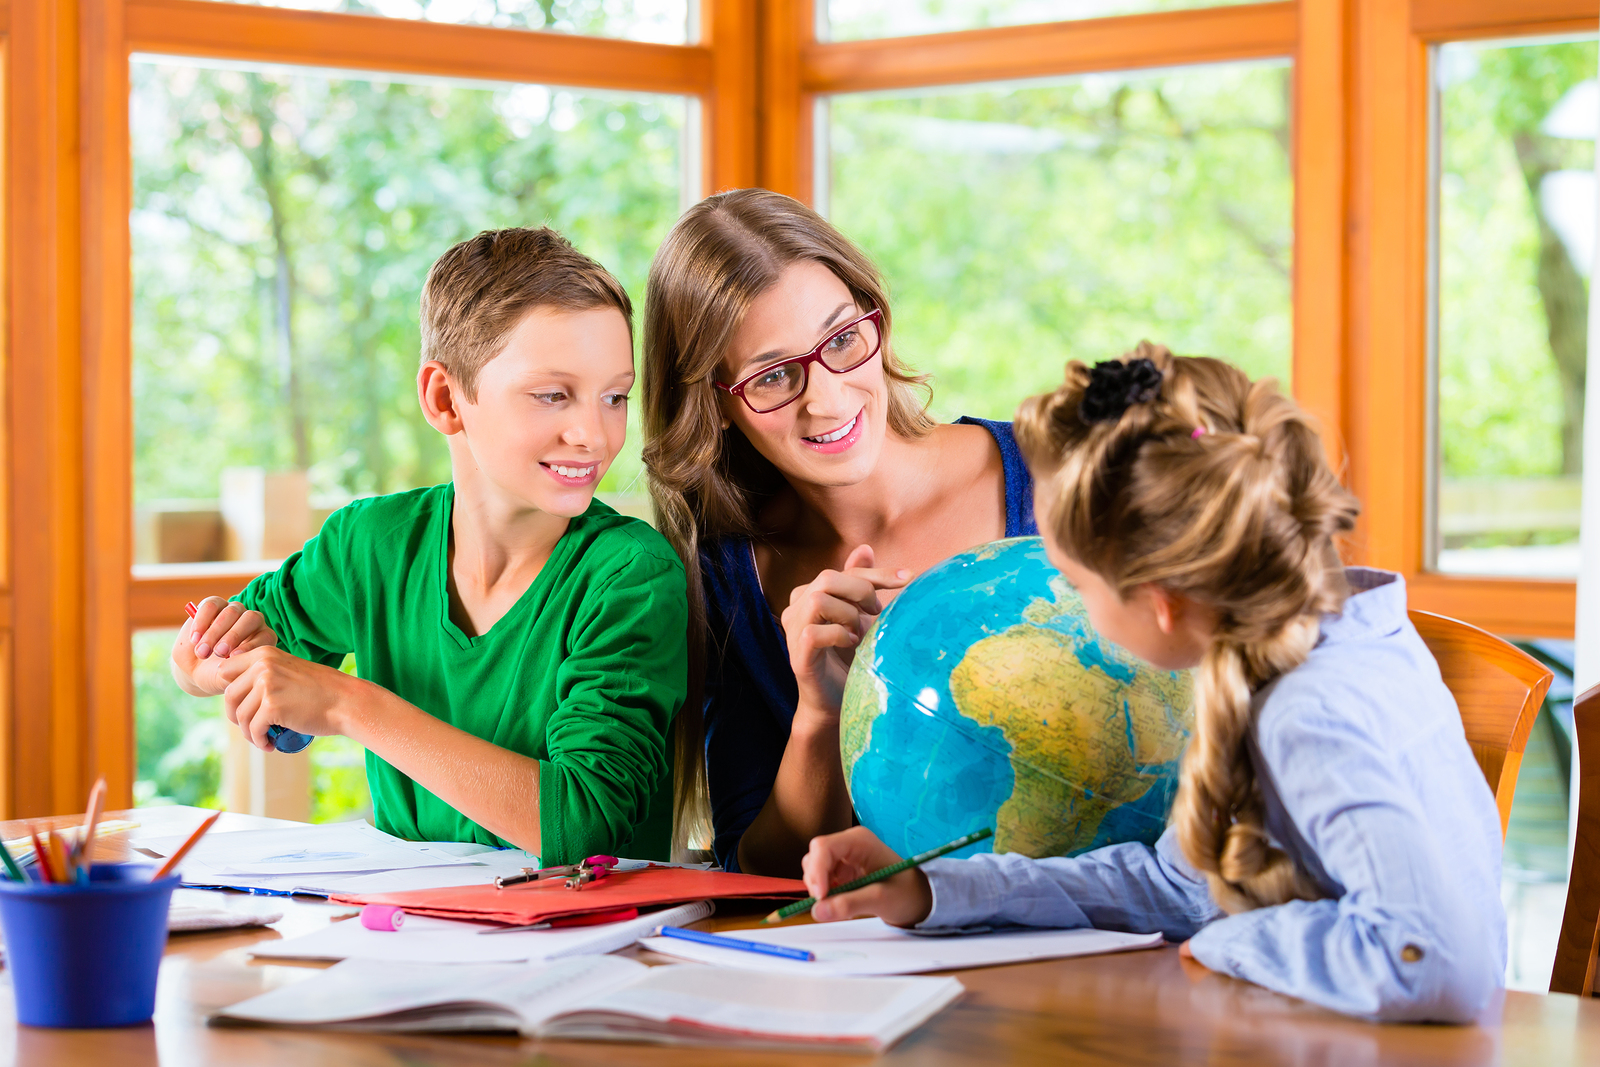 5 Ways to Homeschool on a Budget